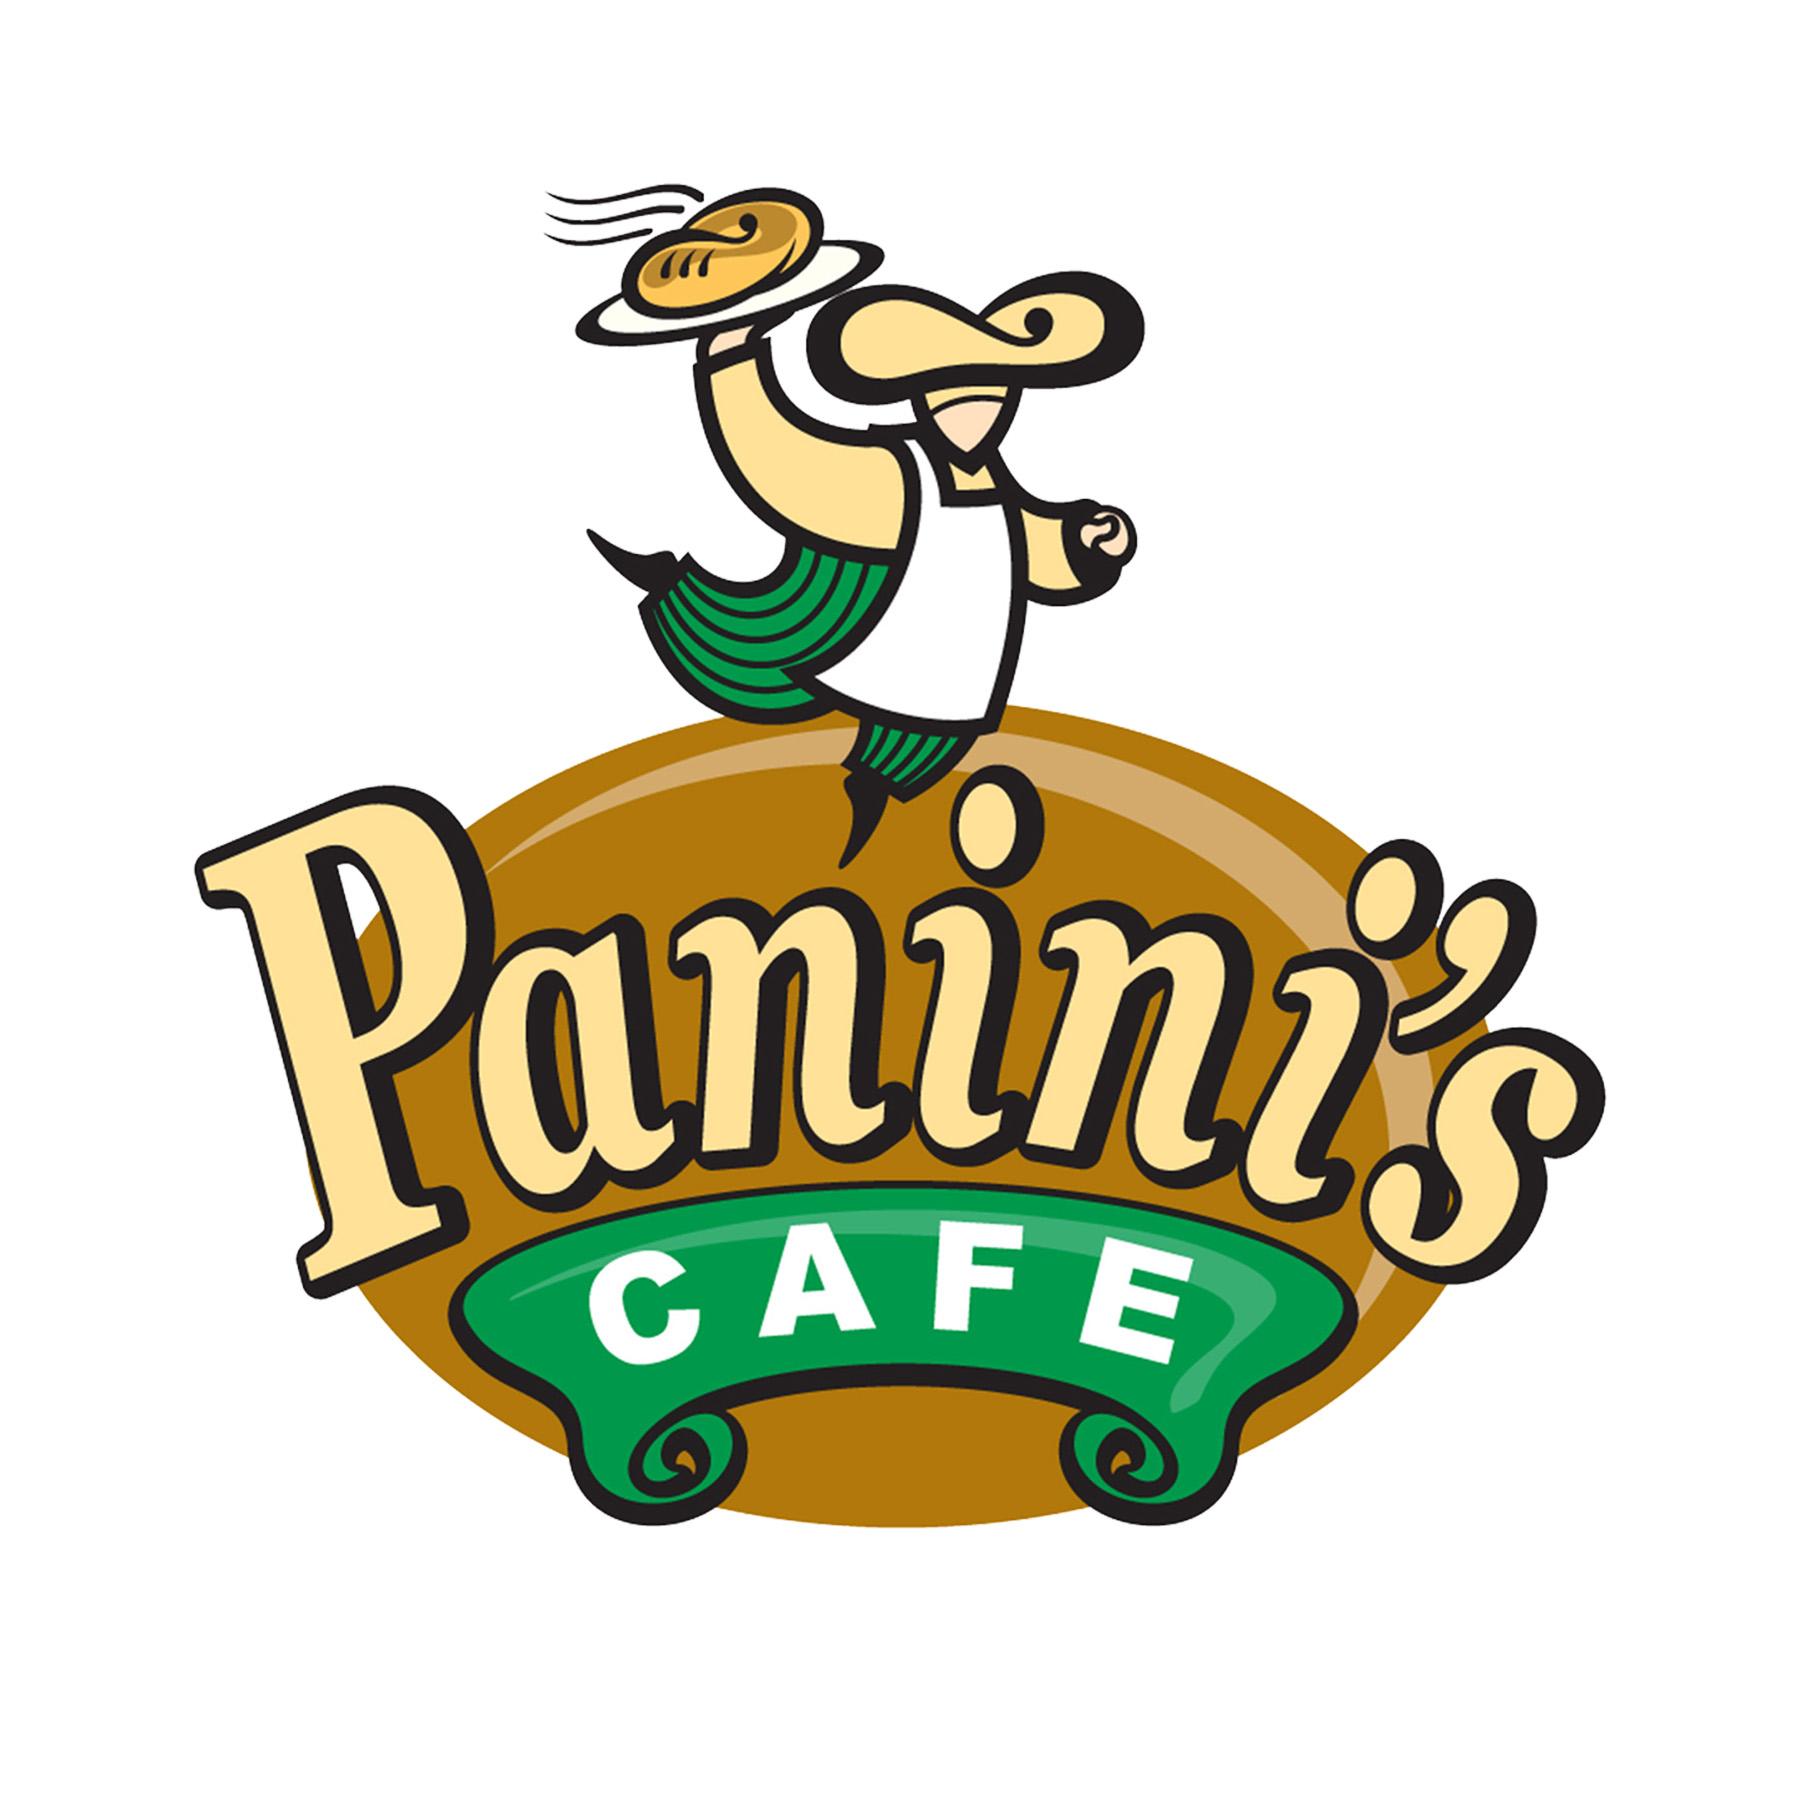 Panini's Cafe.jpg